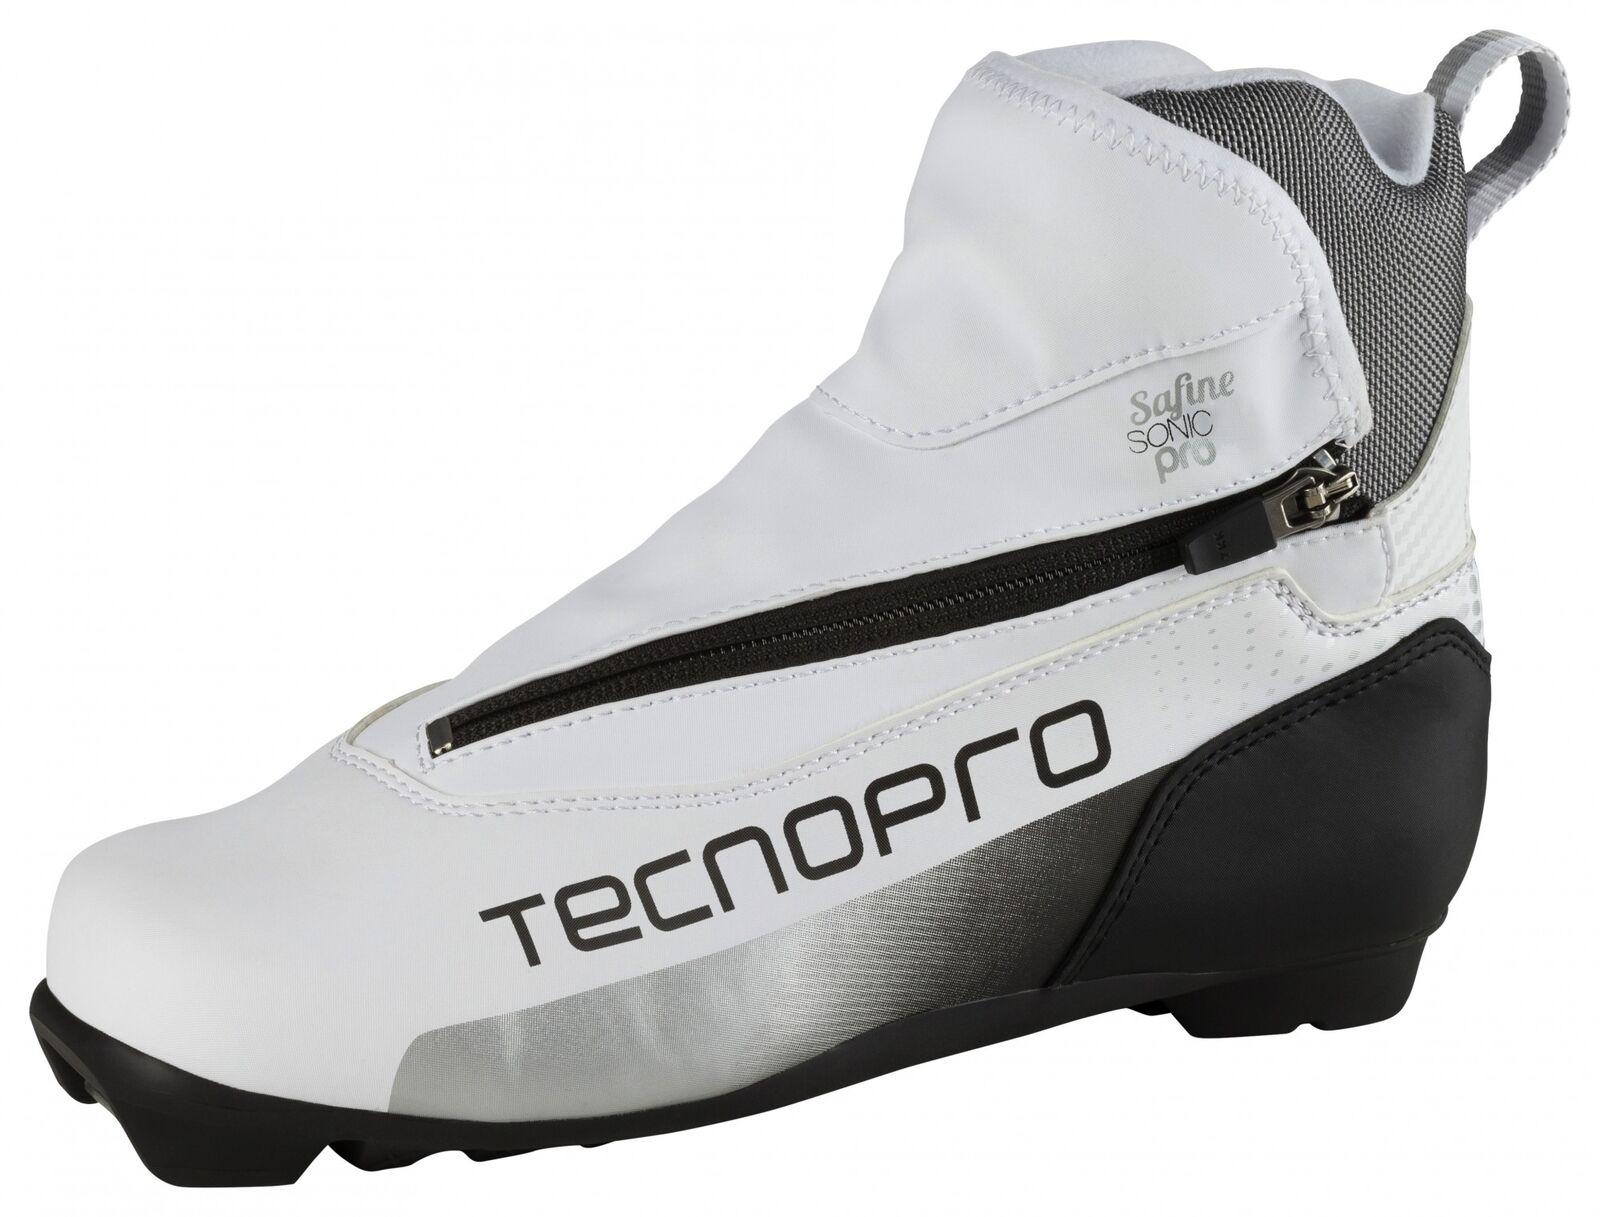 TECNOPRO Langlaufschuh Safine Sonic PRO NNN kompatibel Langlaufschuhe Damen